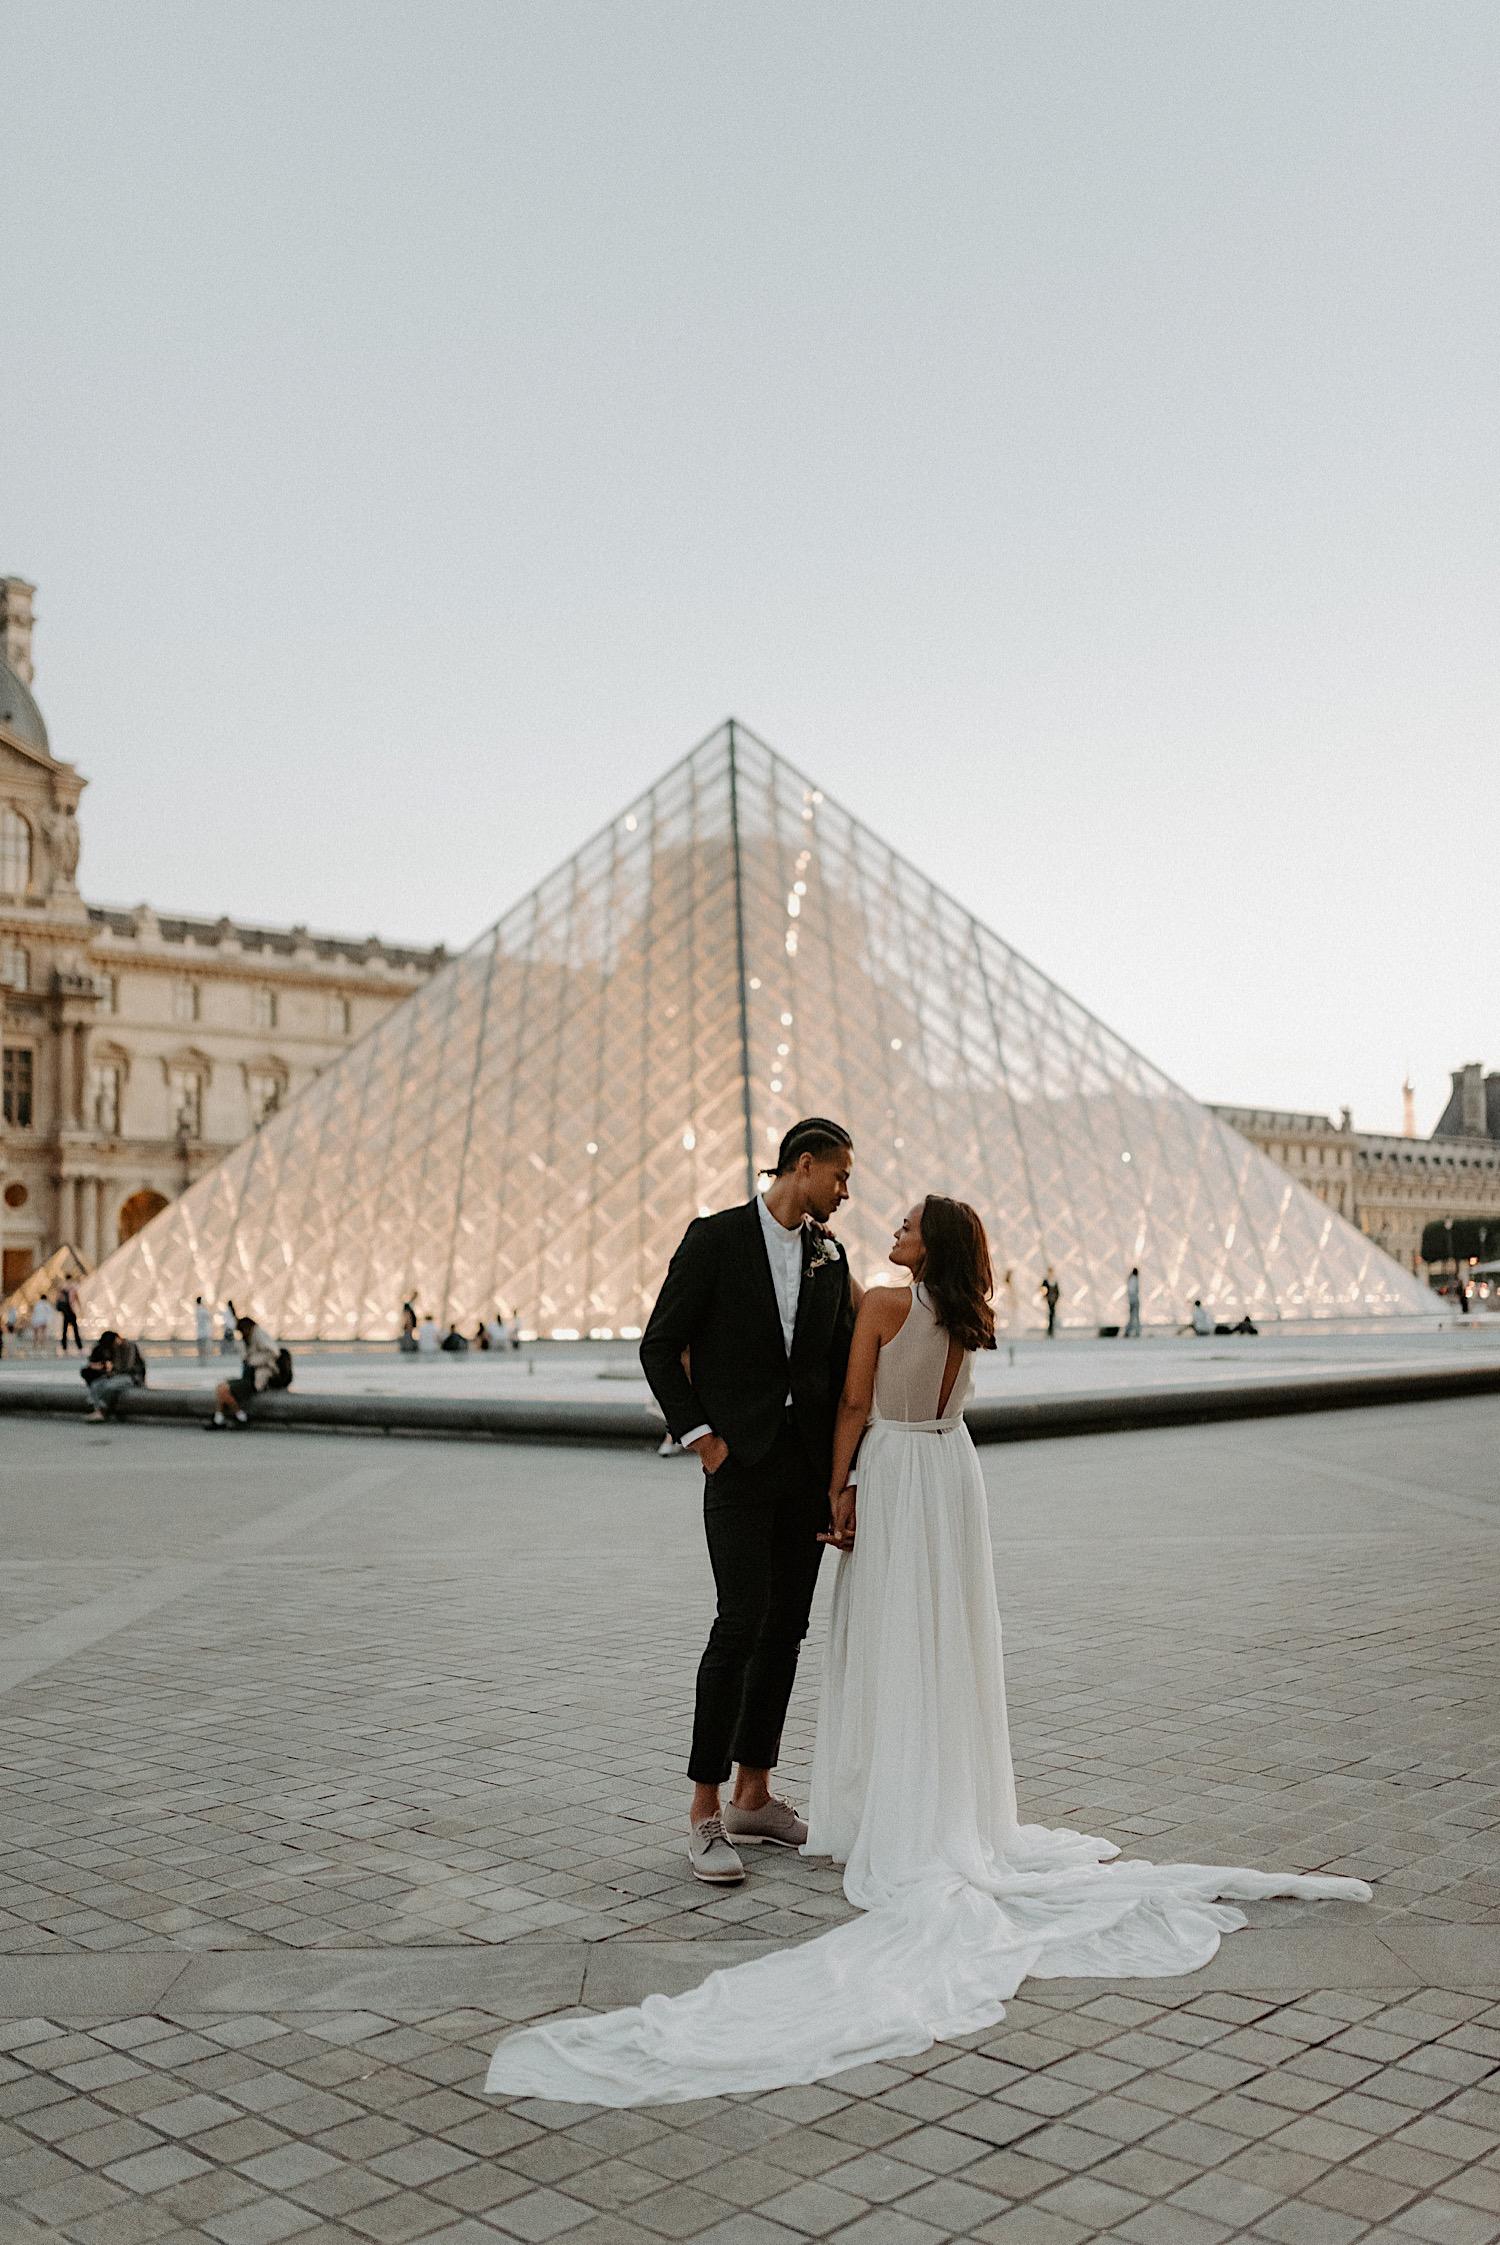 Paris Louvre Wedding Photos Paris Wedding Photographer Destination Wedding France Anais Possamai Photography 25